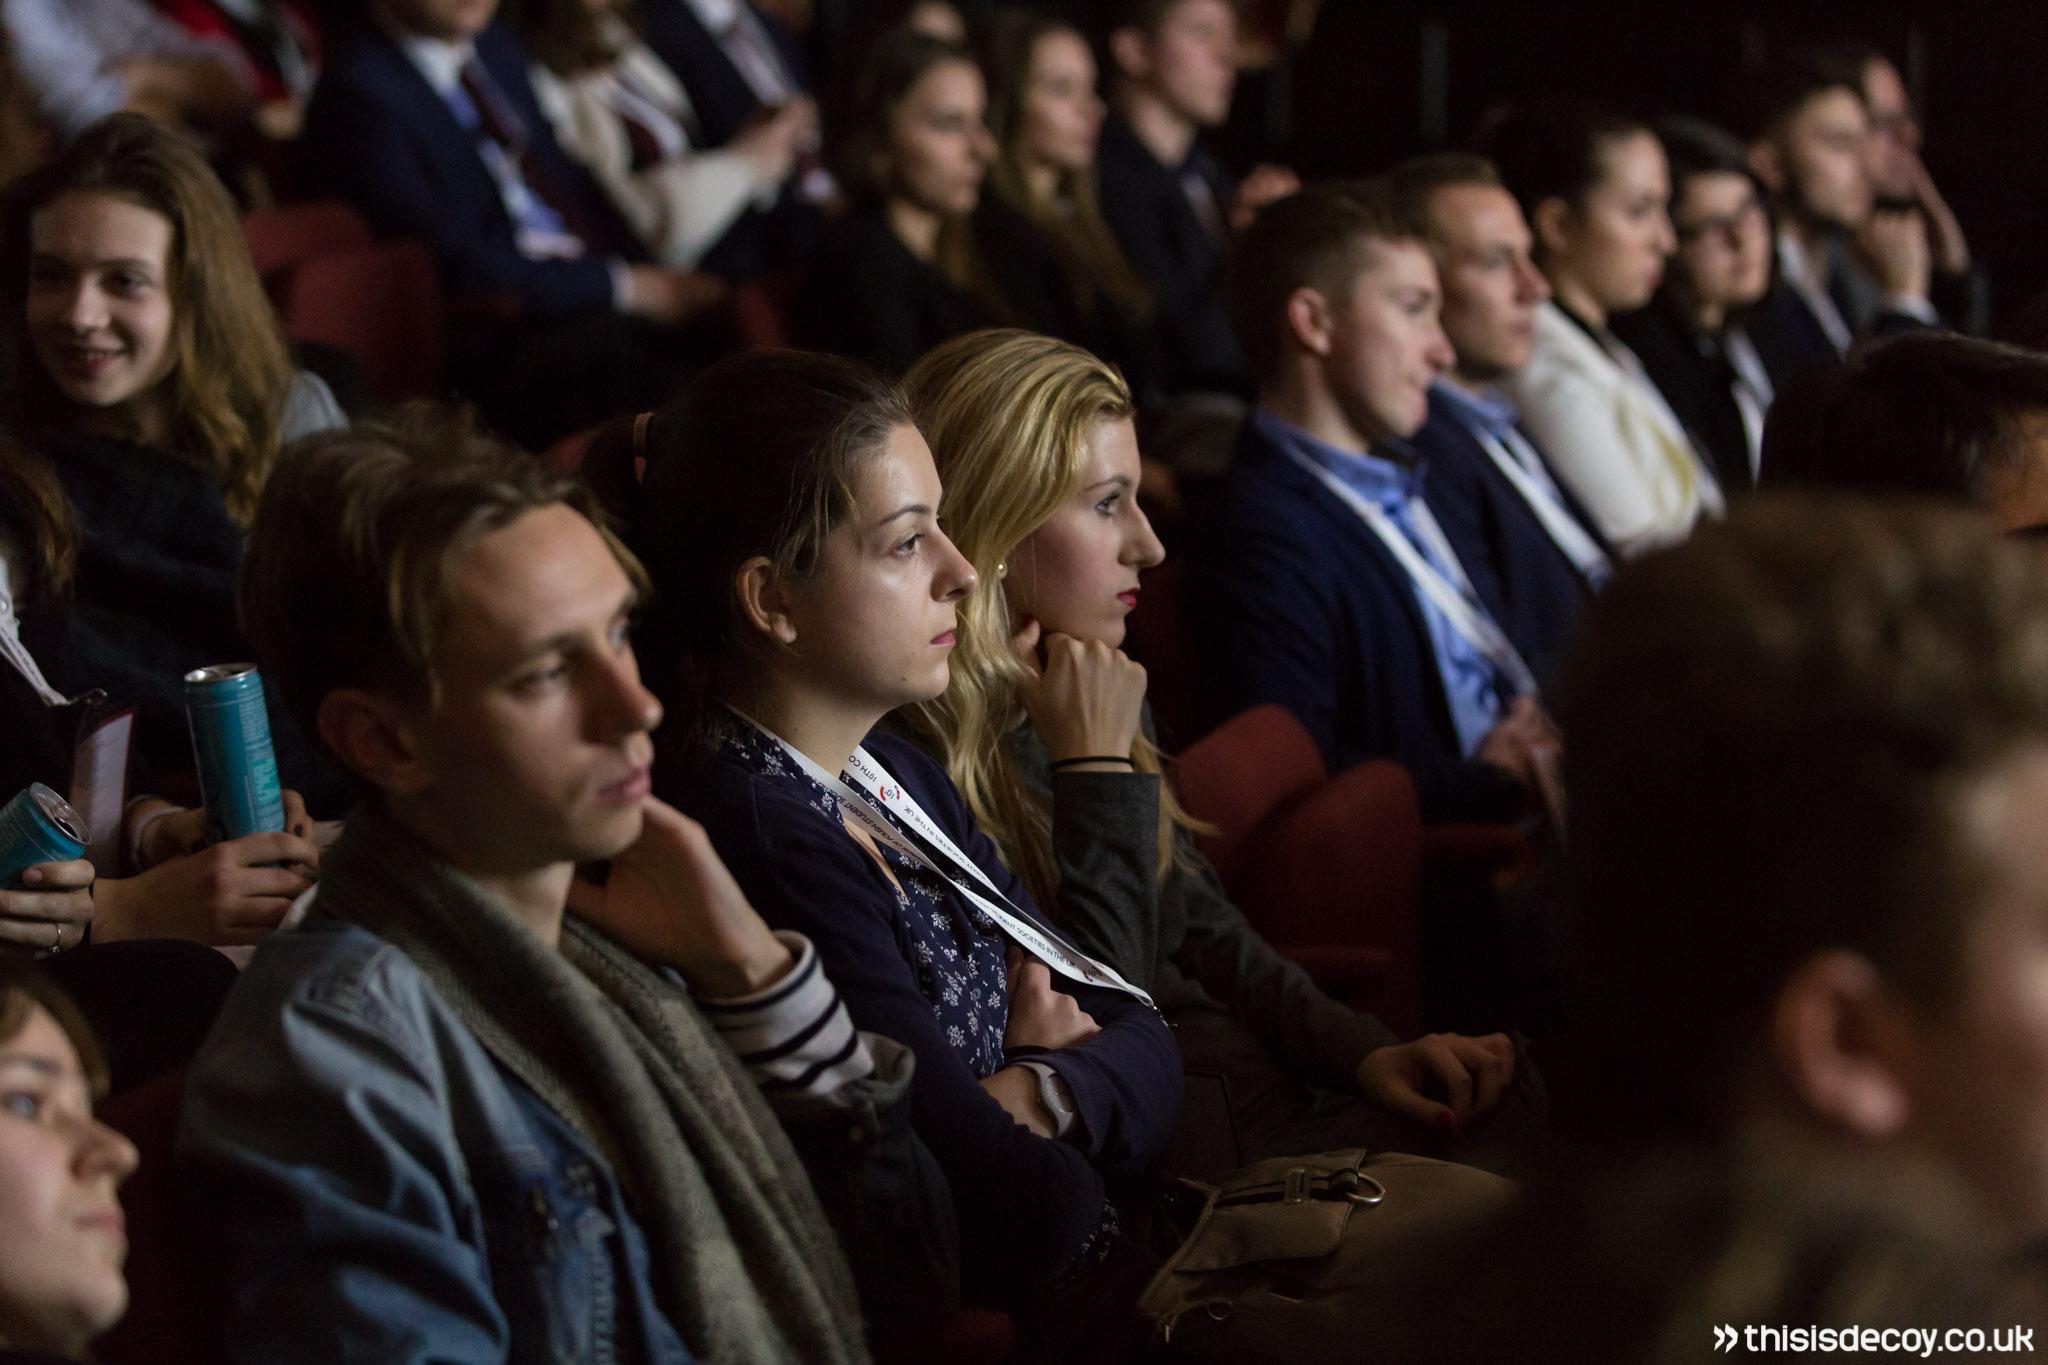 Polish Congress of Student Societies in the UK 2017 - Decoy Media - 10.jpg